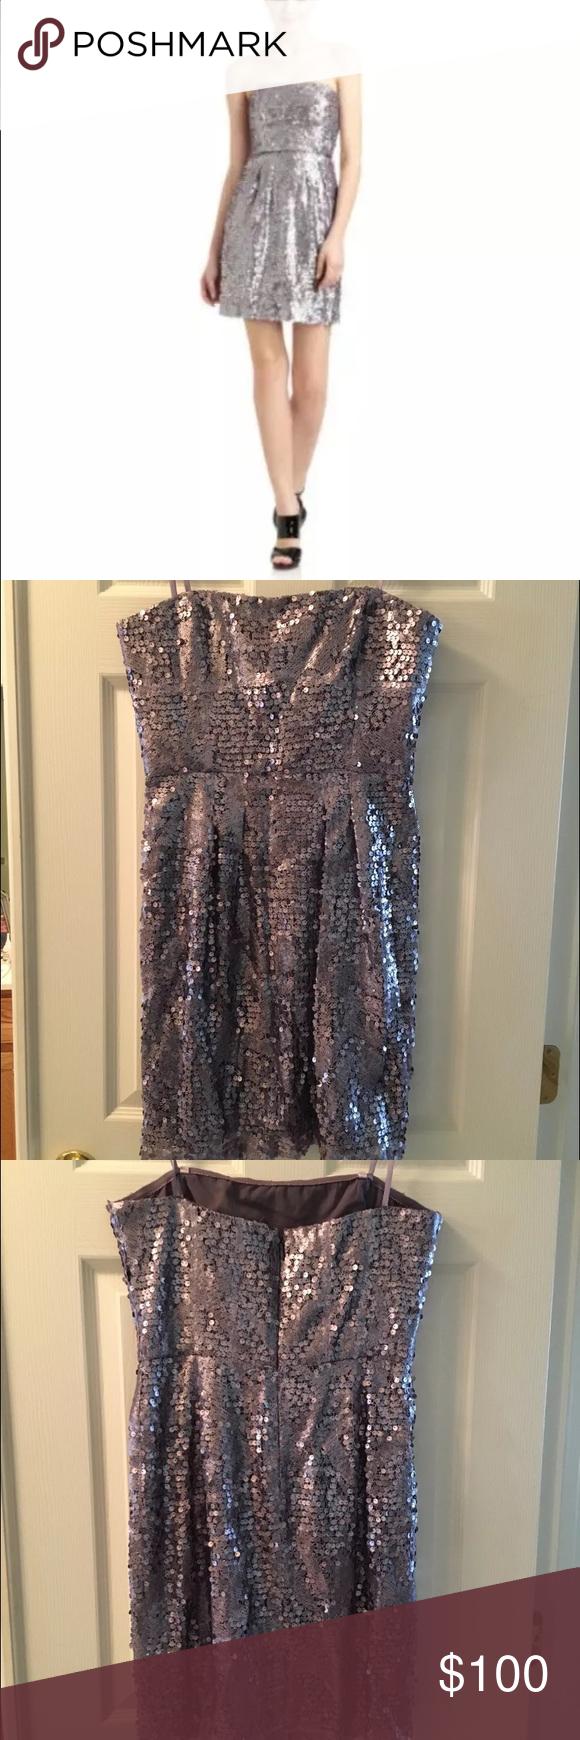 New Bcbg Maxazaria Sequin Sparkly New Years Dress Gorgeous Brand New Bcbg Dress Originally 258